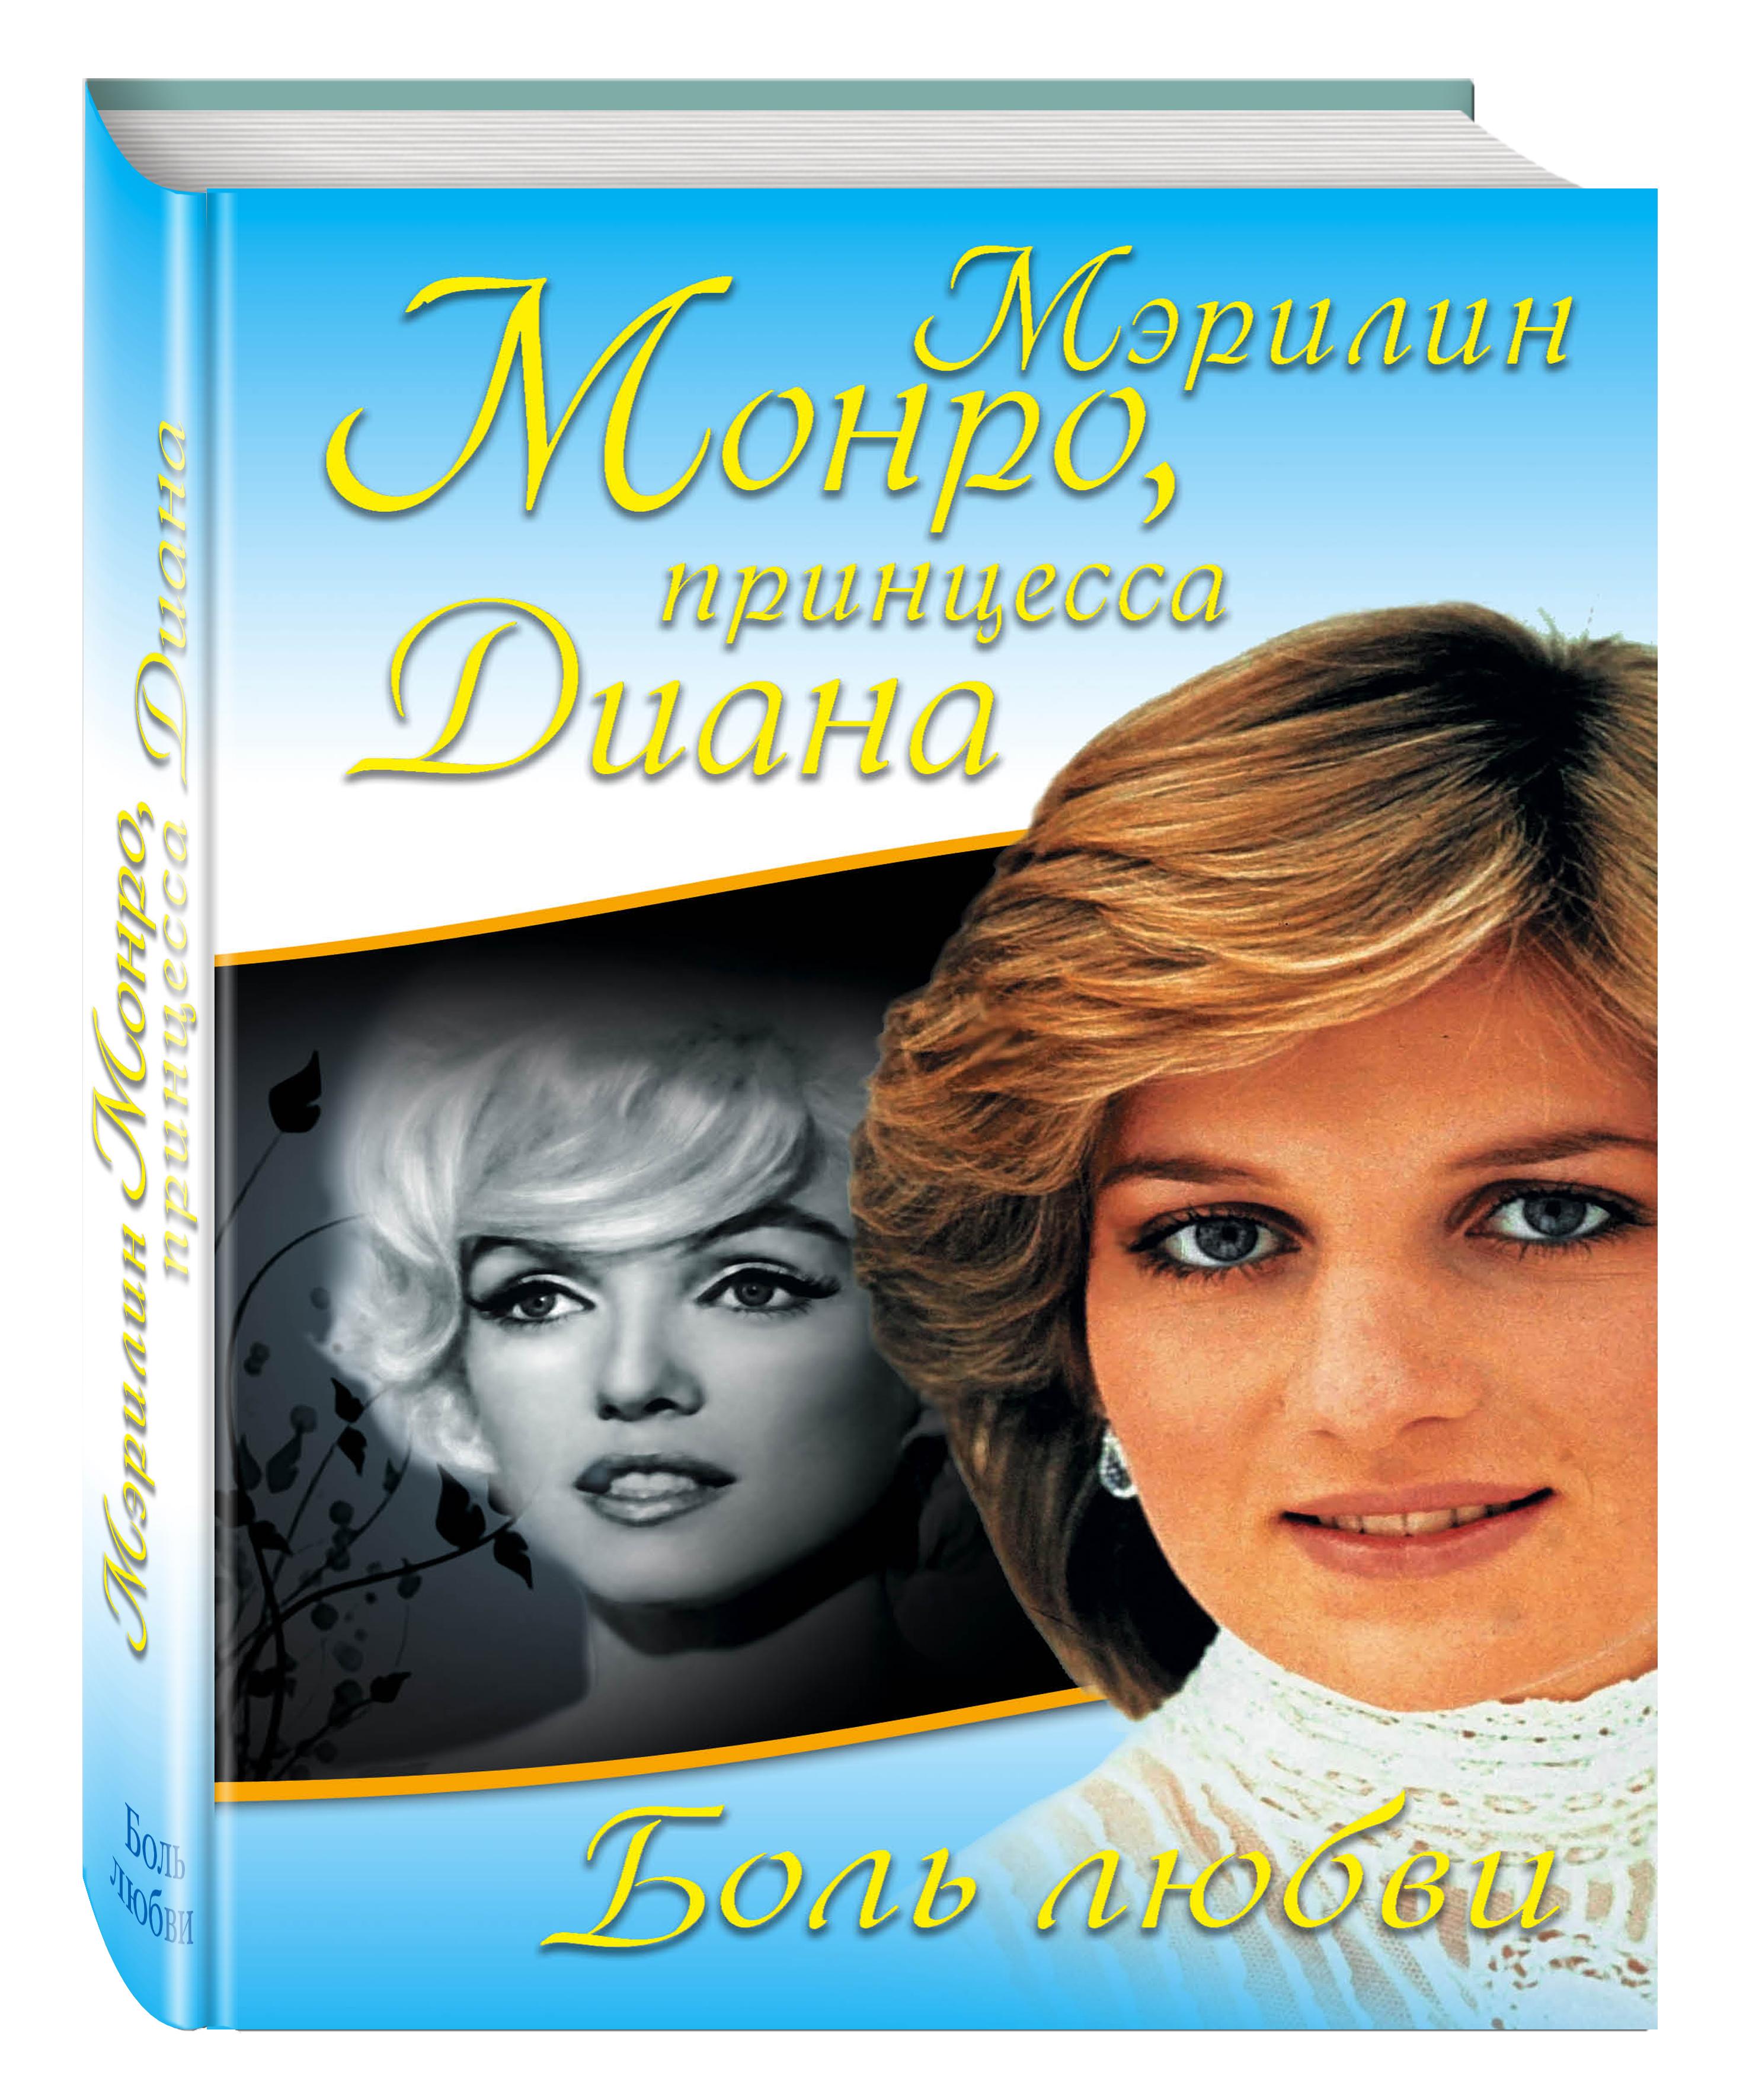 Мэрилин Монро, принцесса Диана. Боль любви от book24.ru